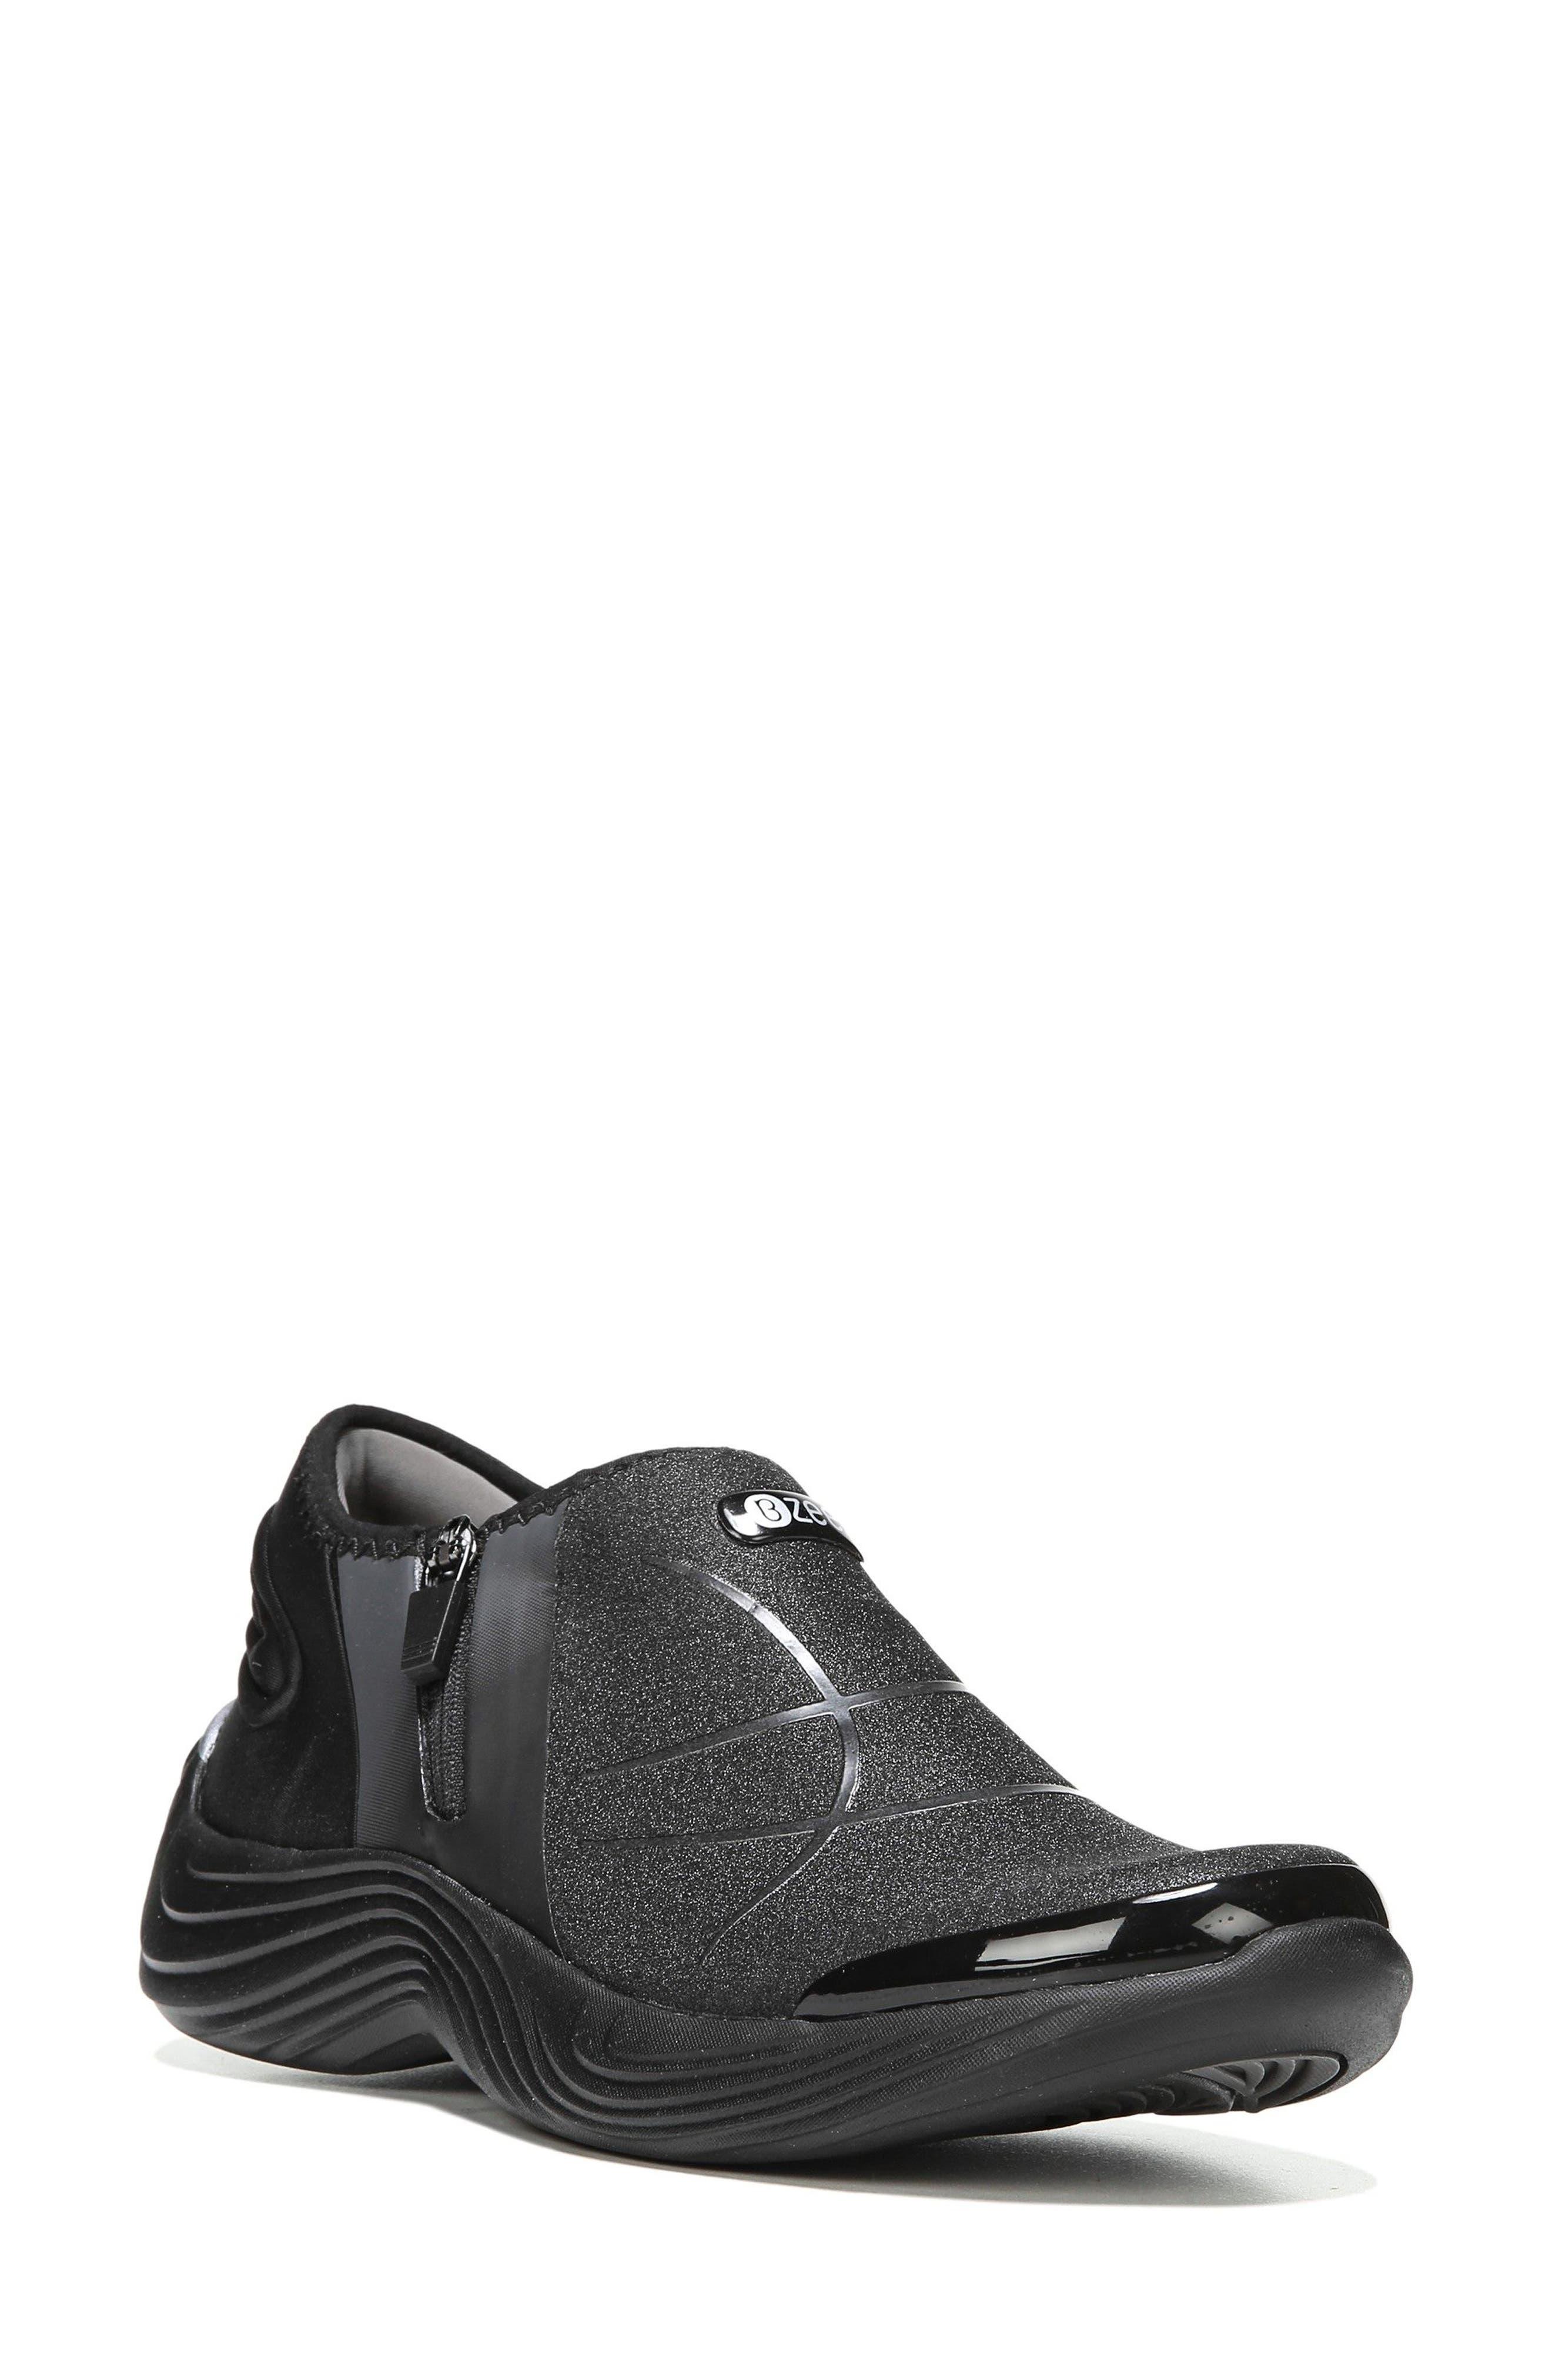 Main Image - BZees Trilogy Slip-On Sneaker (Women)